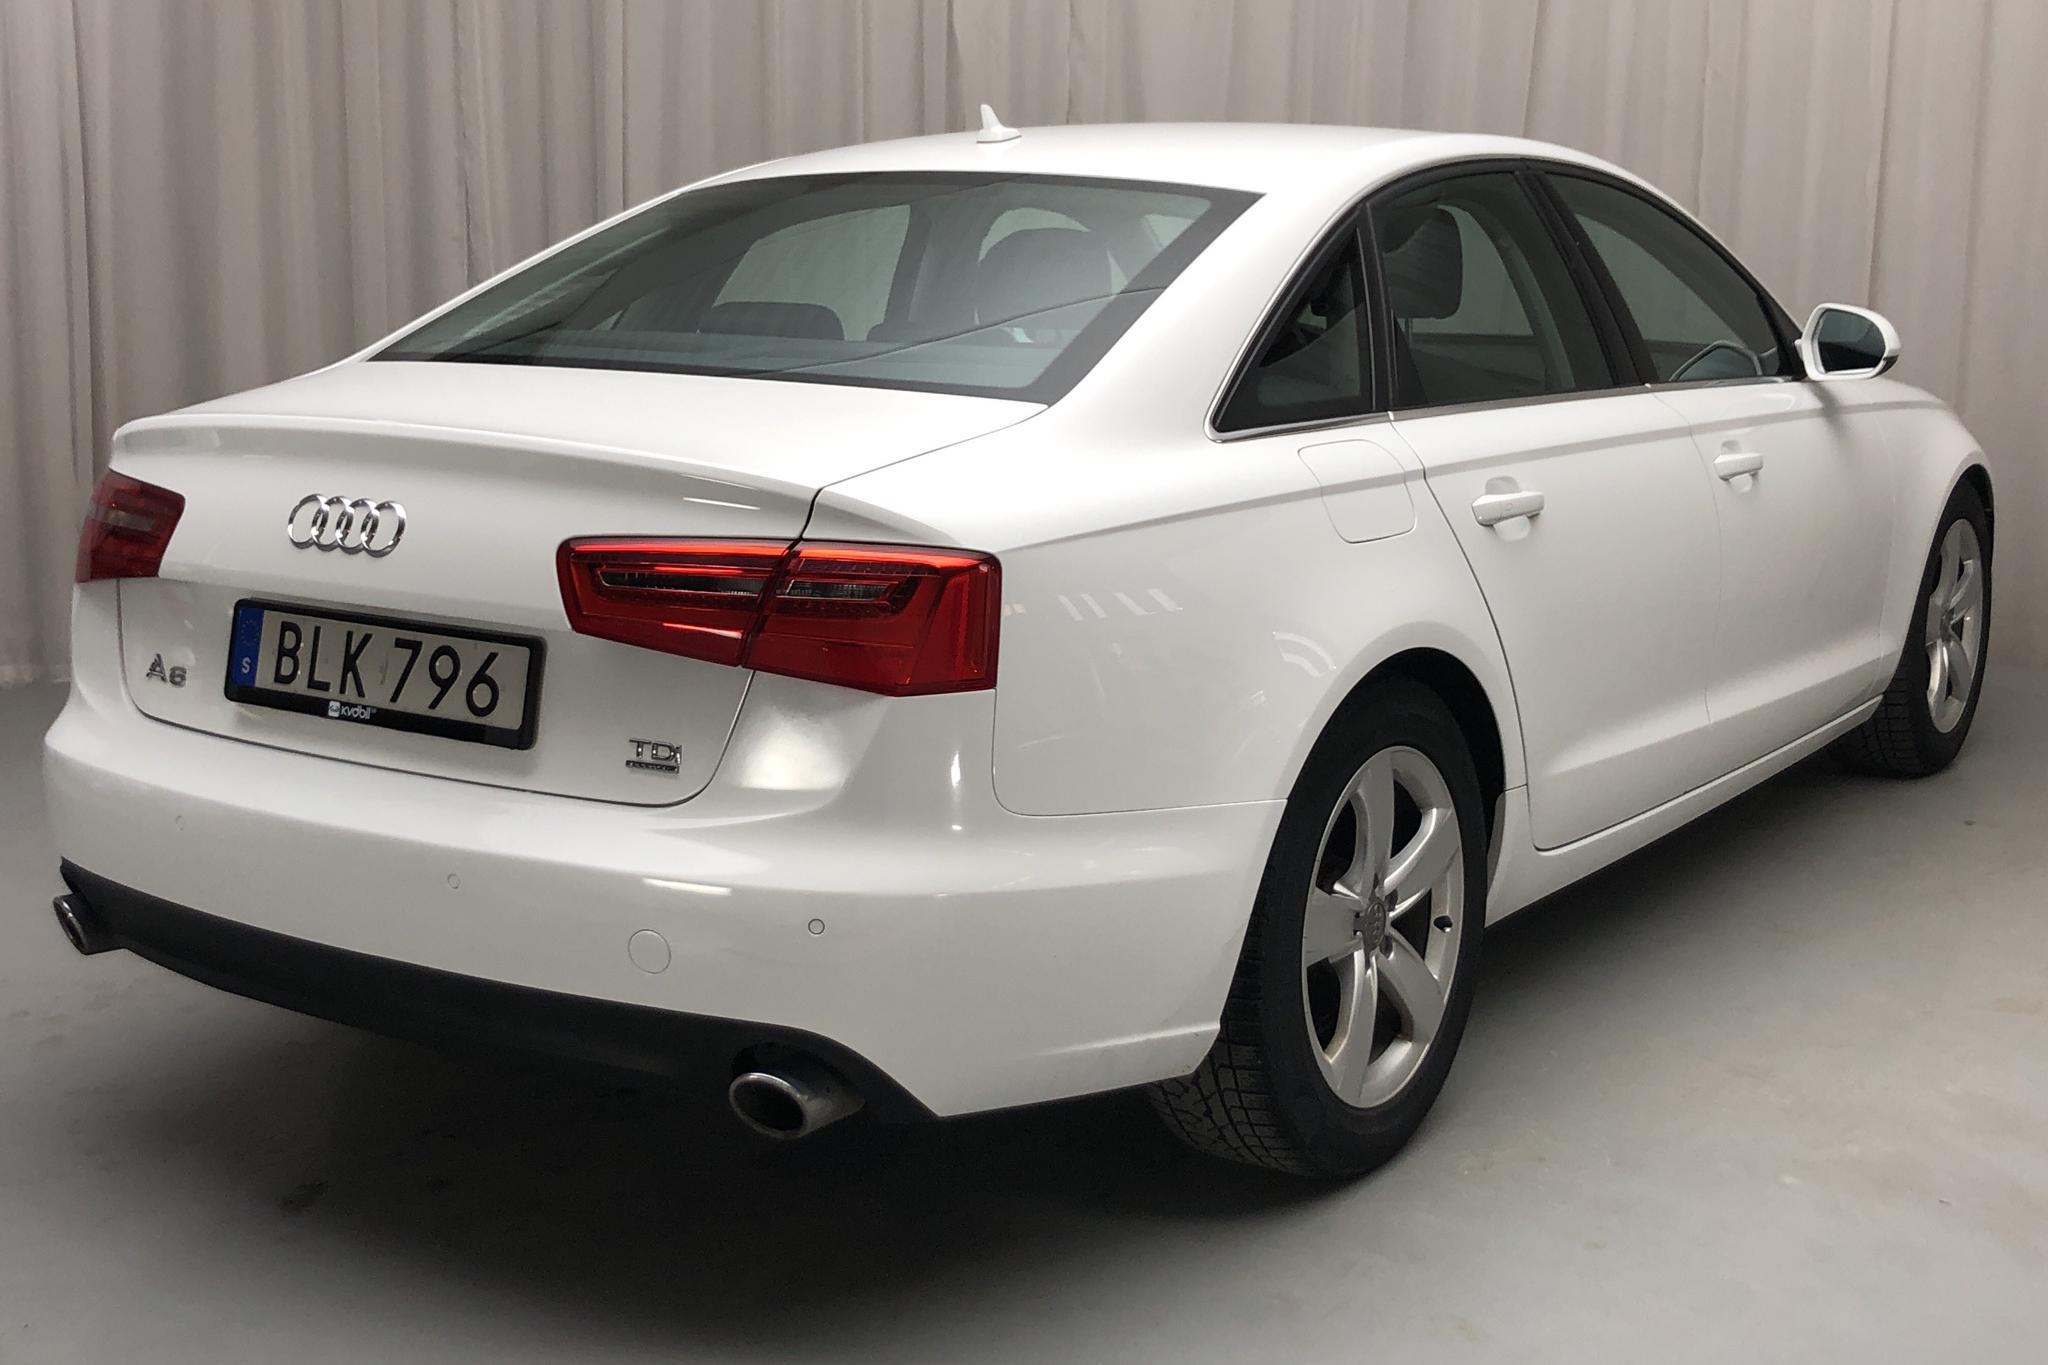 Audi A6 3.0 TDI quattro (204hk) - 128 590 km - Automatic - white - 2014